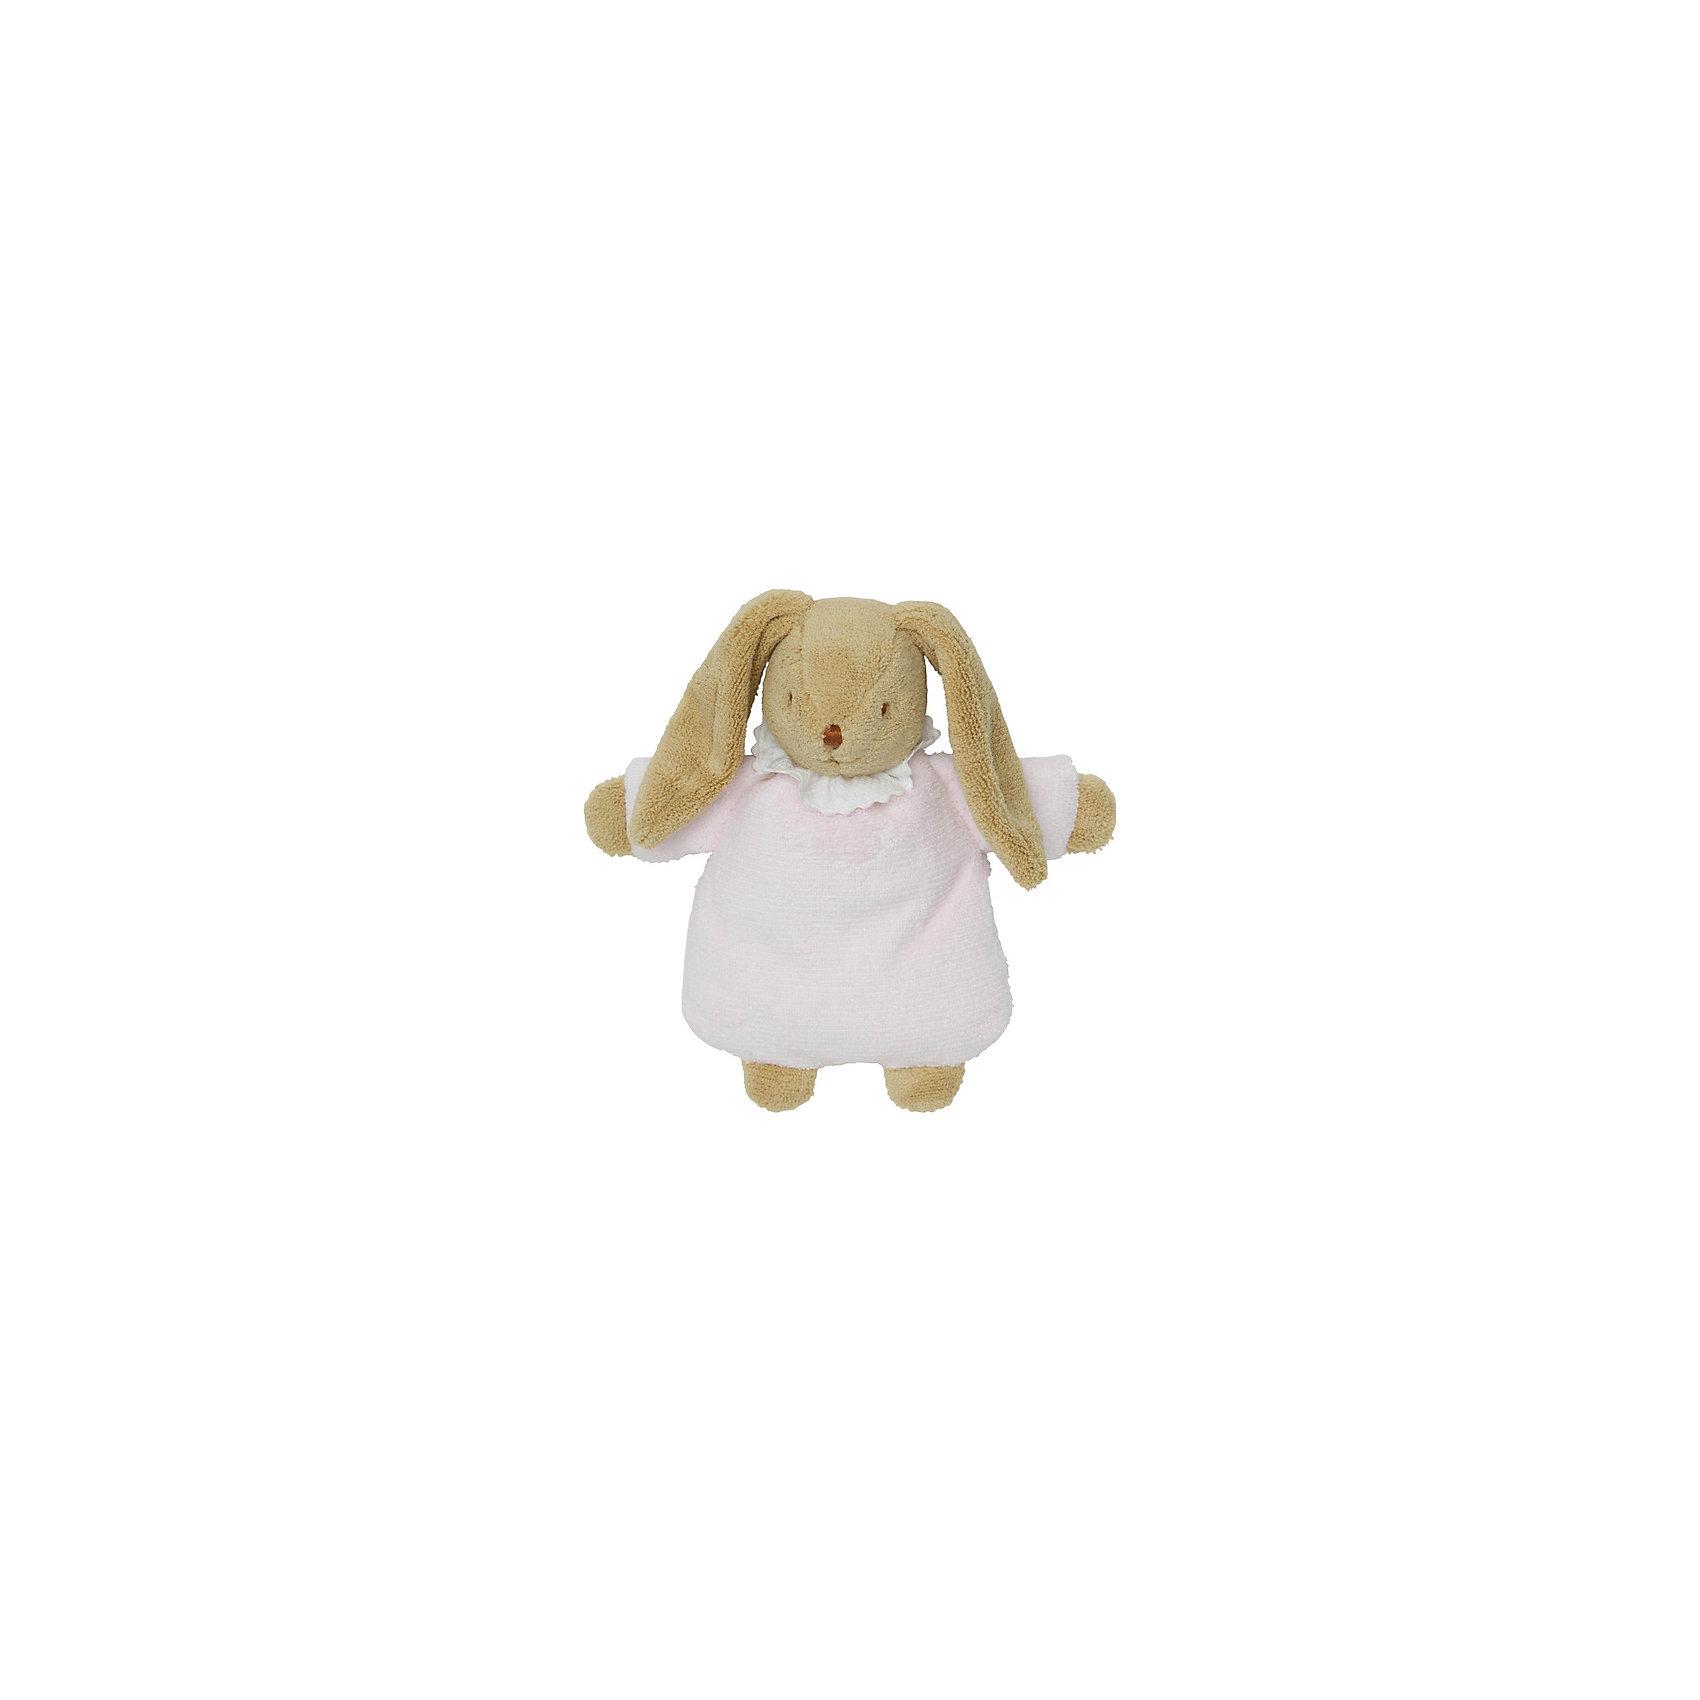 trousselier мягкая озвученная игрушка зайка цвет фуксия 25 см TROUSSELIER Мягкая погремушка Зайка, розовый, 19см, Trousselier